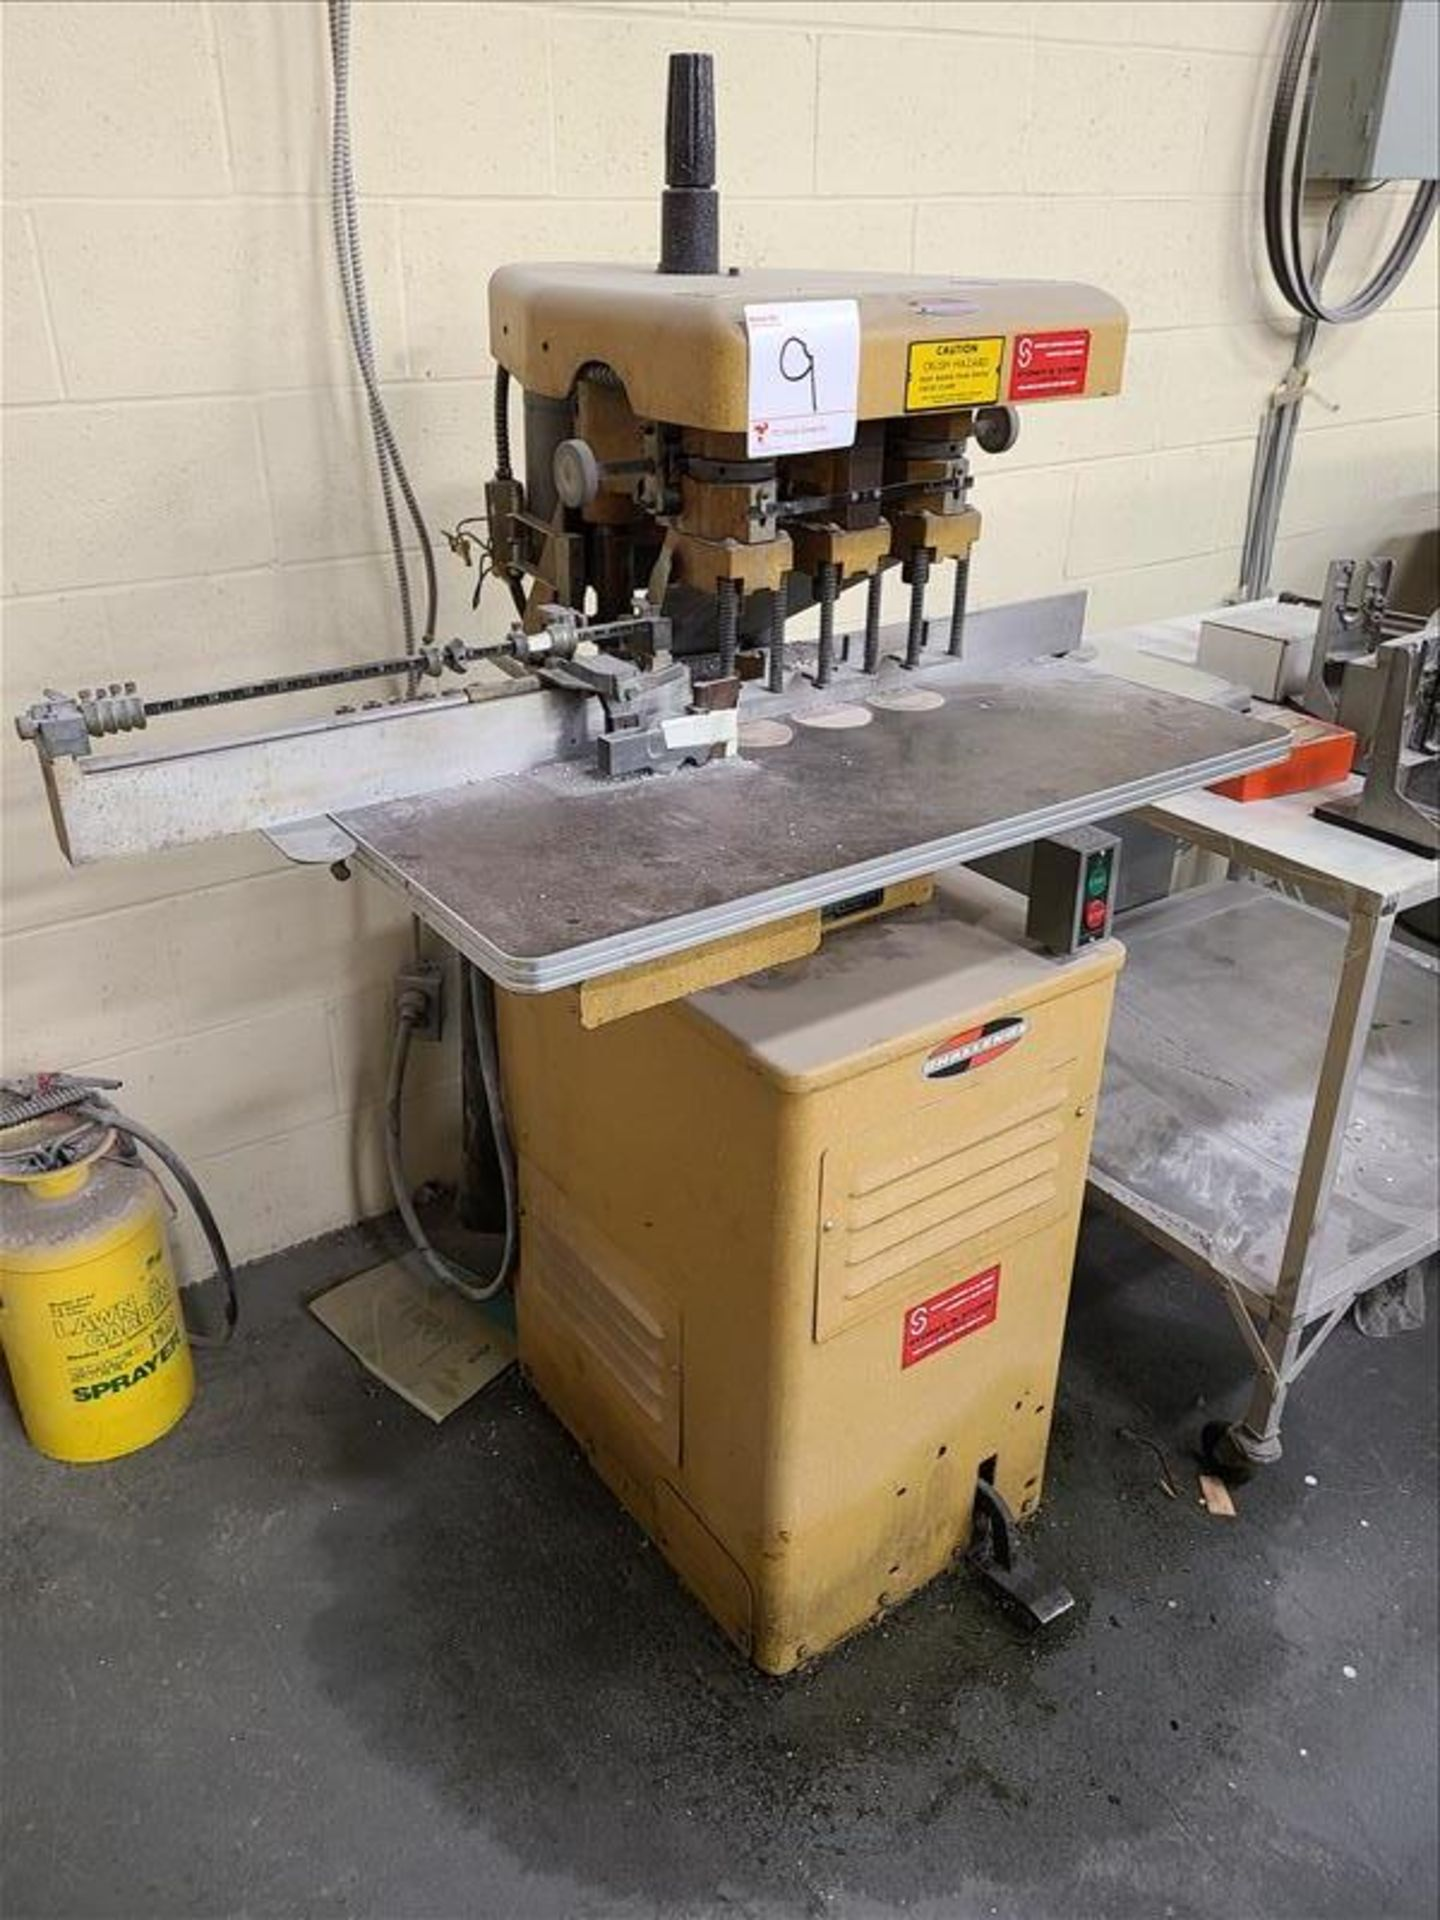 Challenge Paper Drill, model EH-3, S/N.42184, 230V, 17 amps, 1 Phase, 60 Hz